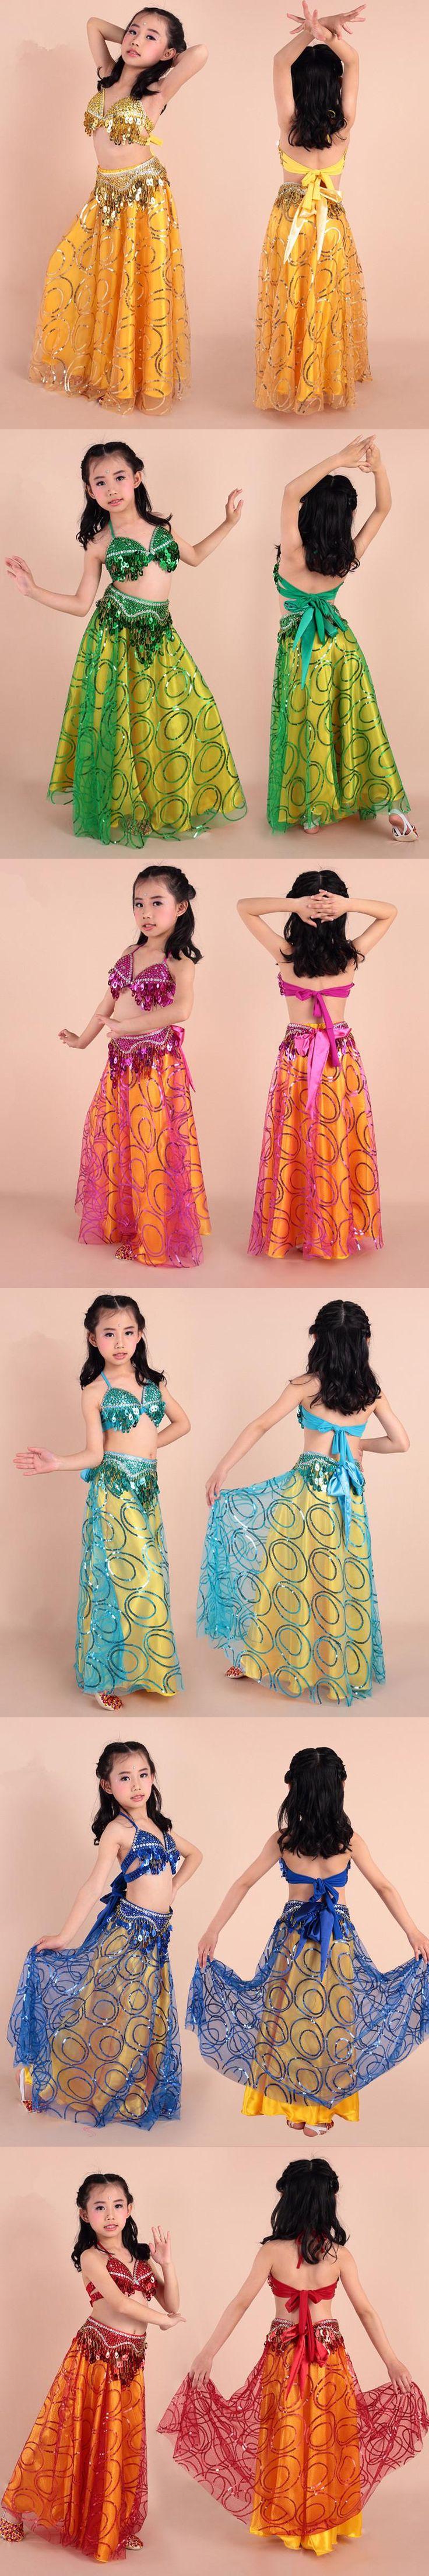 New Arrivals Girl Belly Dance Costume Set danza del vientre Children Bollywood Dance Costumes Children Dance Clothes for Dancer